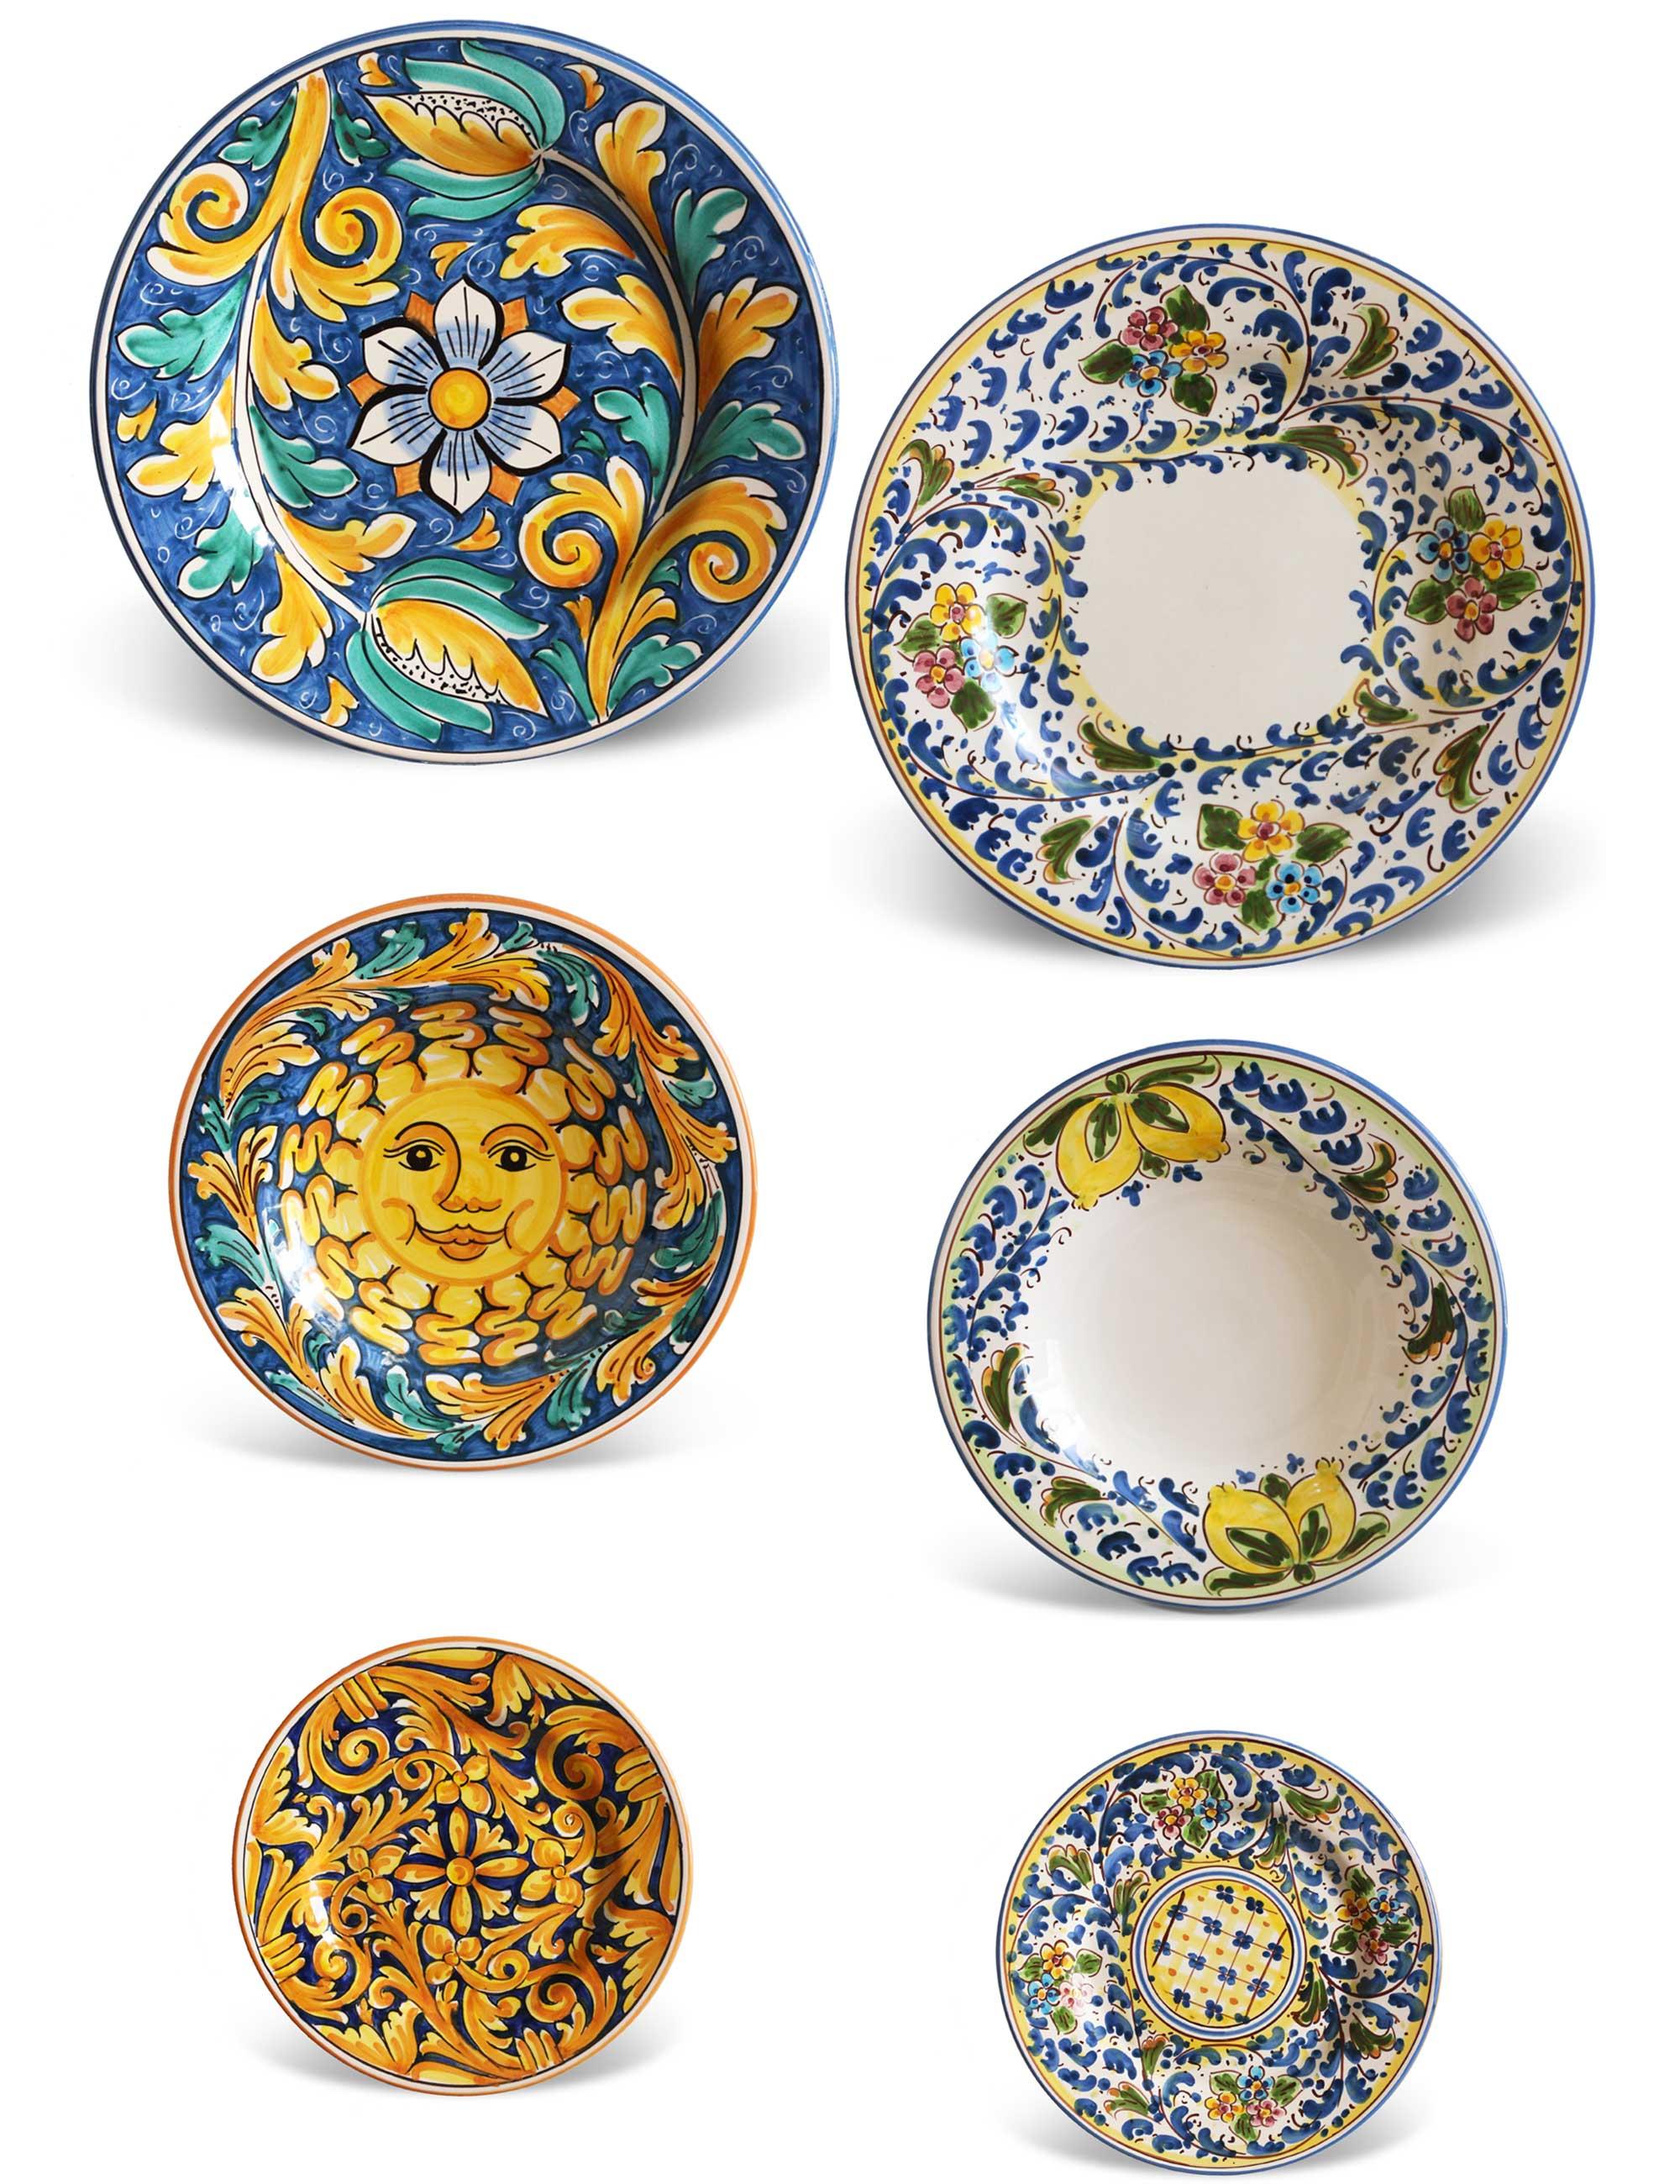 artisan sicilian plates tablewear set two people Suli  sc 1 st  Ceramiche Caltagirone Maremoro & Sicilian artisan plates | Set SULI | Maremoro Caltagirone Ceramics